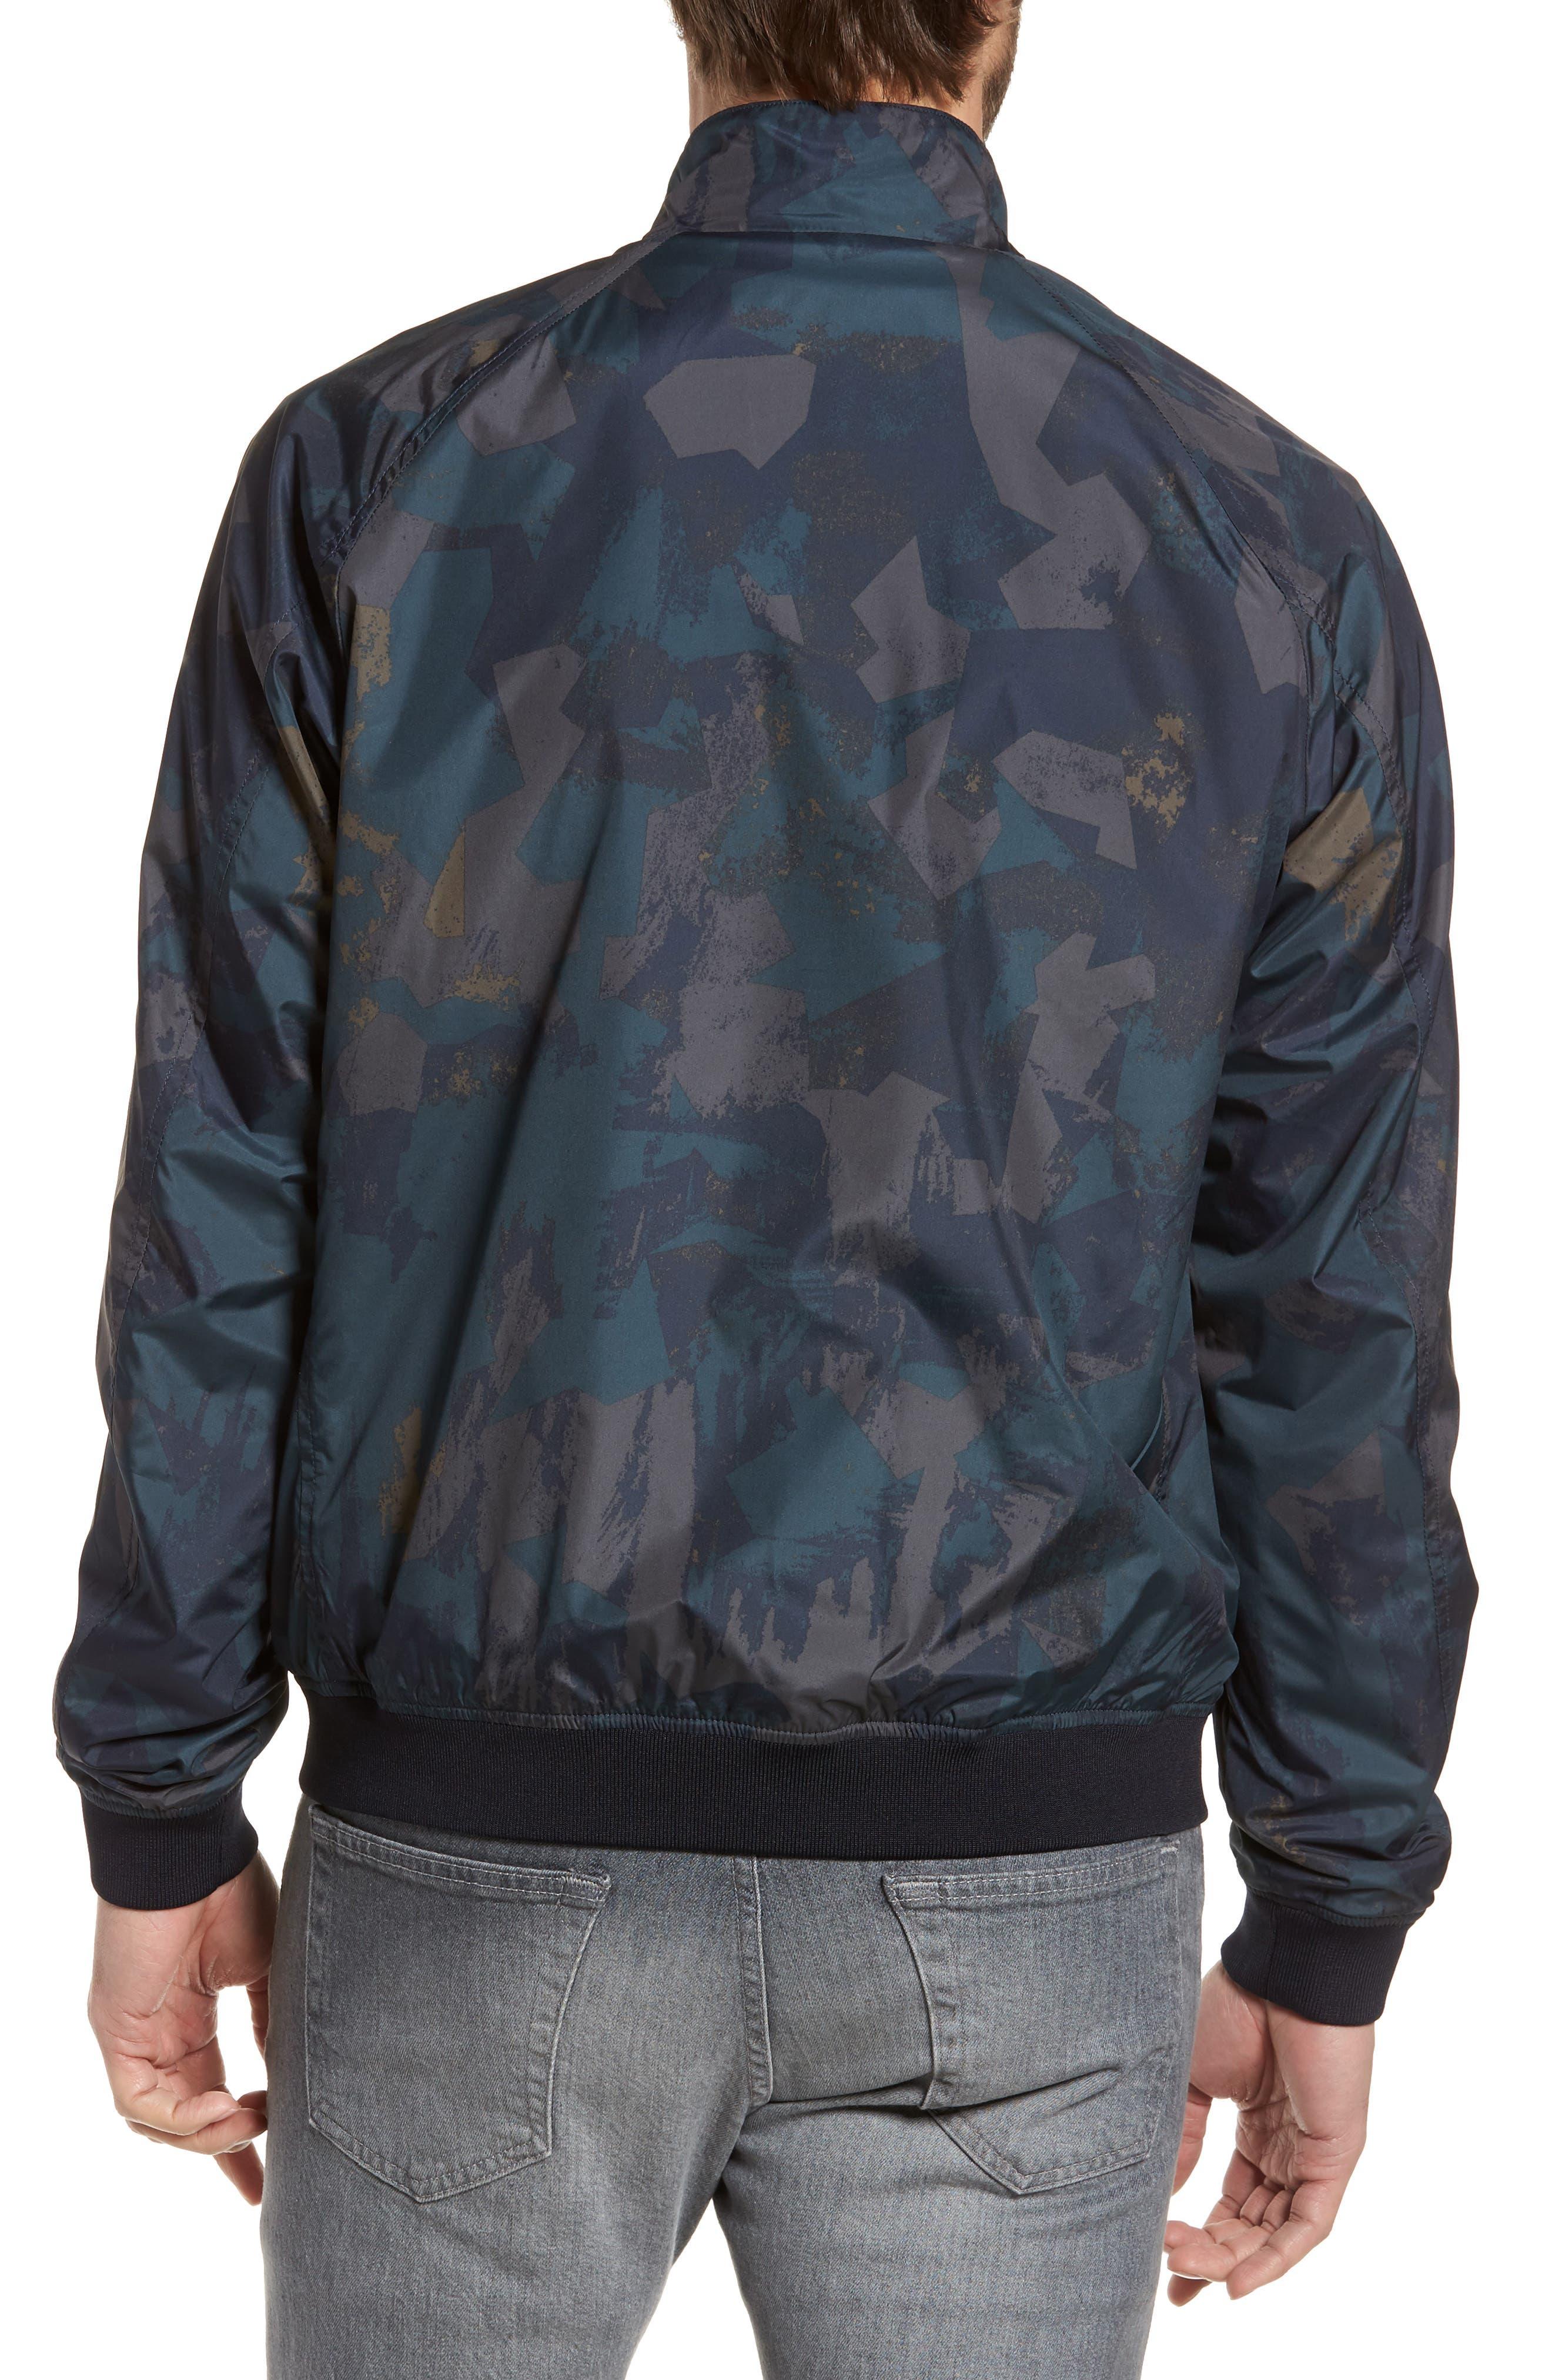 & Bros. Shore Reversible Bomber Jacket,                             Alternate thumbnail 2, color,                             Melton Blue Camo